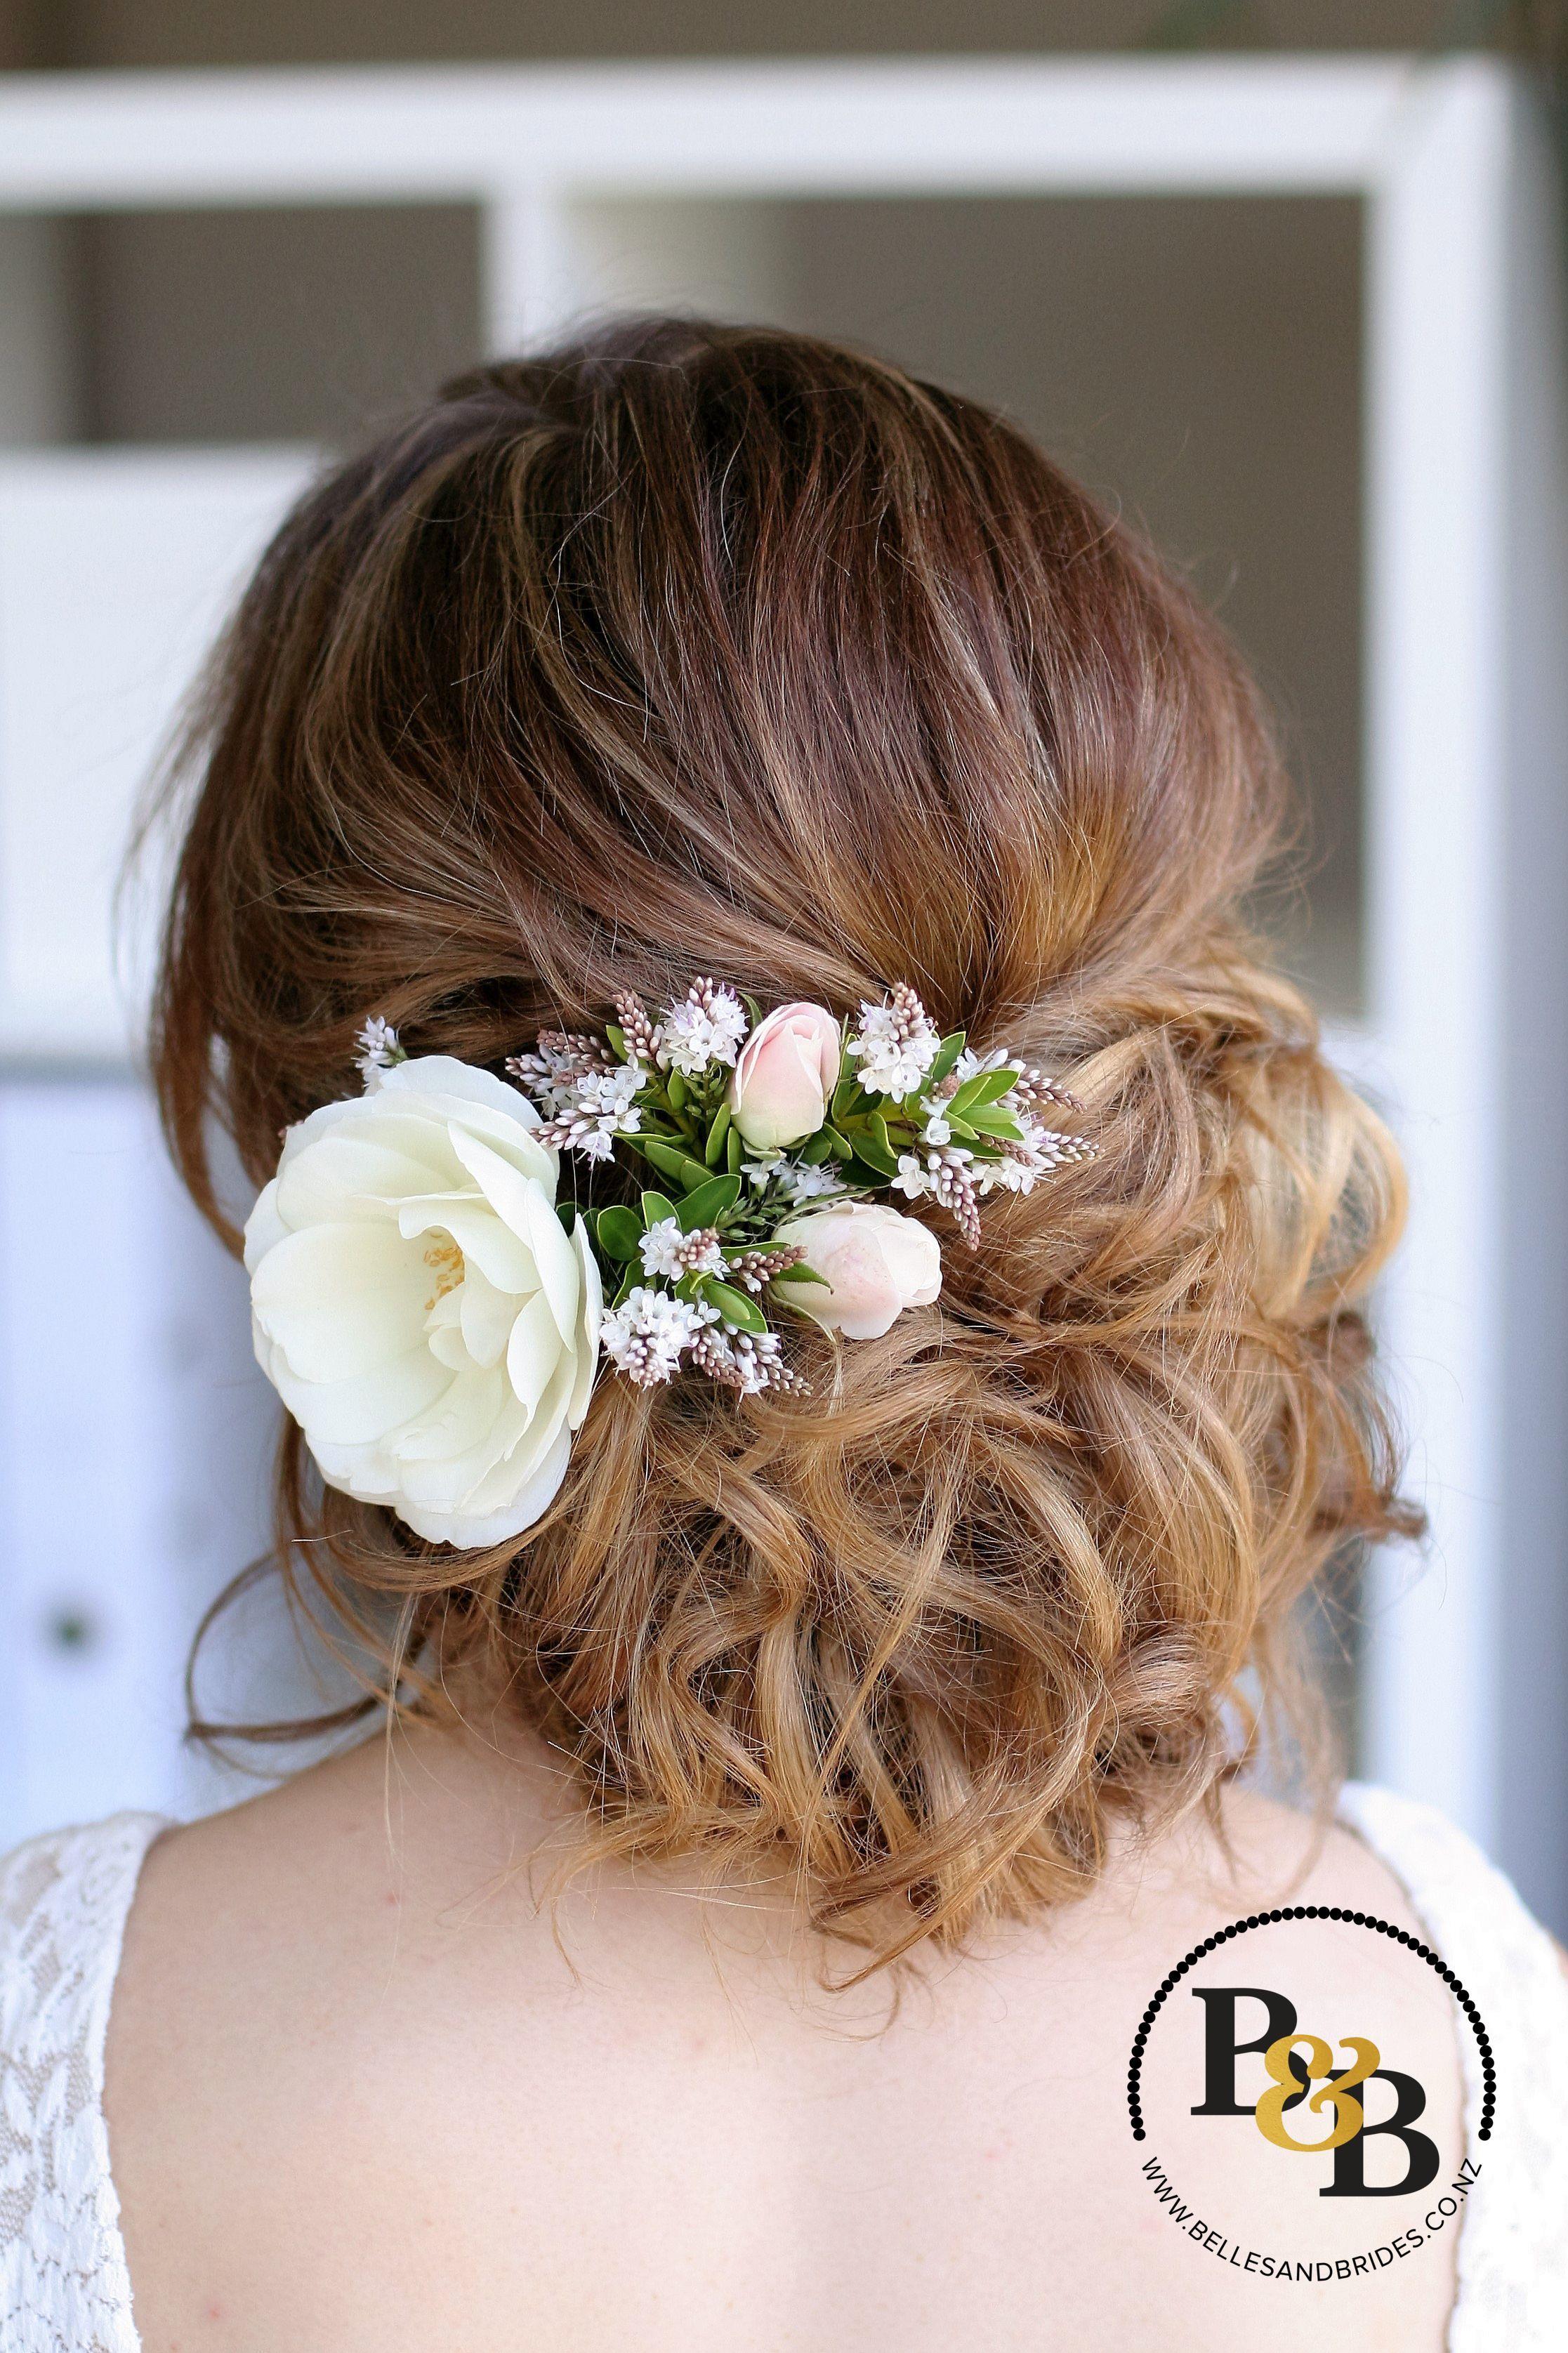 Love This Beautiful Romantic Wedding Hair Style With Flowers Weddinghair Romanticupdo Bridesmaidhair Wedding Hair Flowers Hair Styles Romantic Wedding Hair